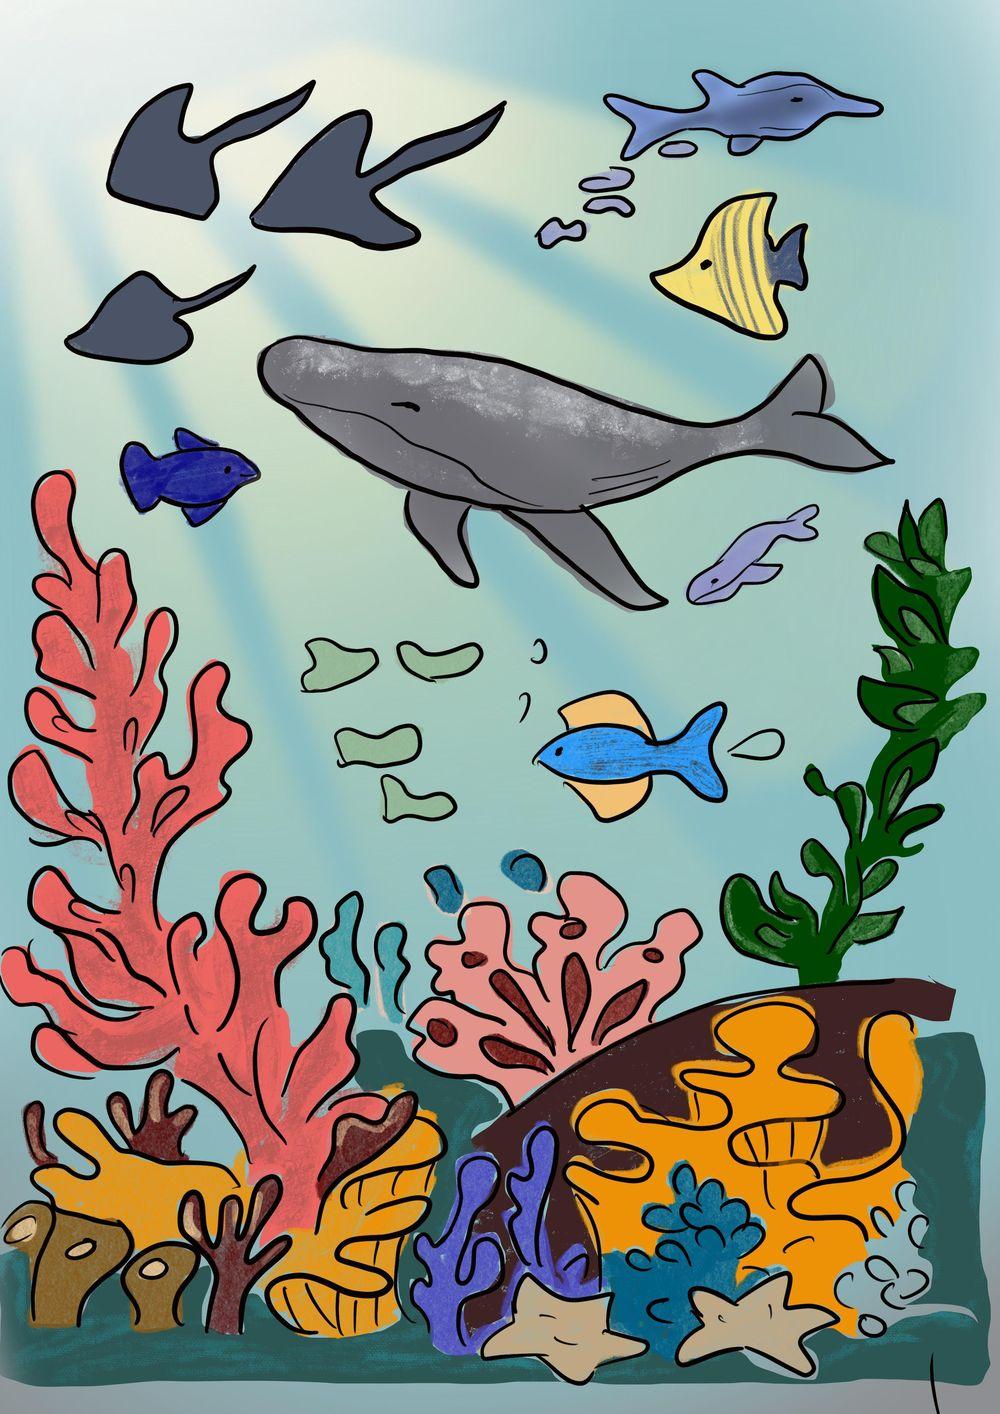 Underwater scene digital illustration - image 1 - student project